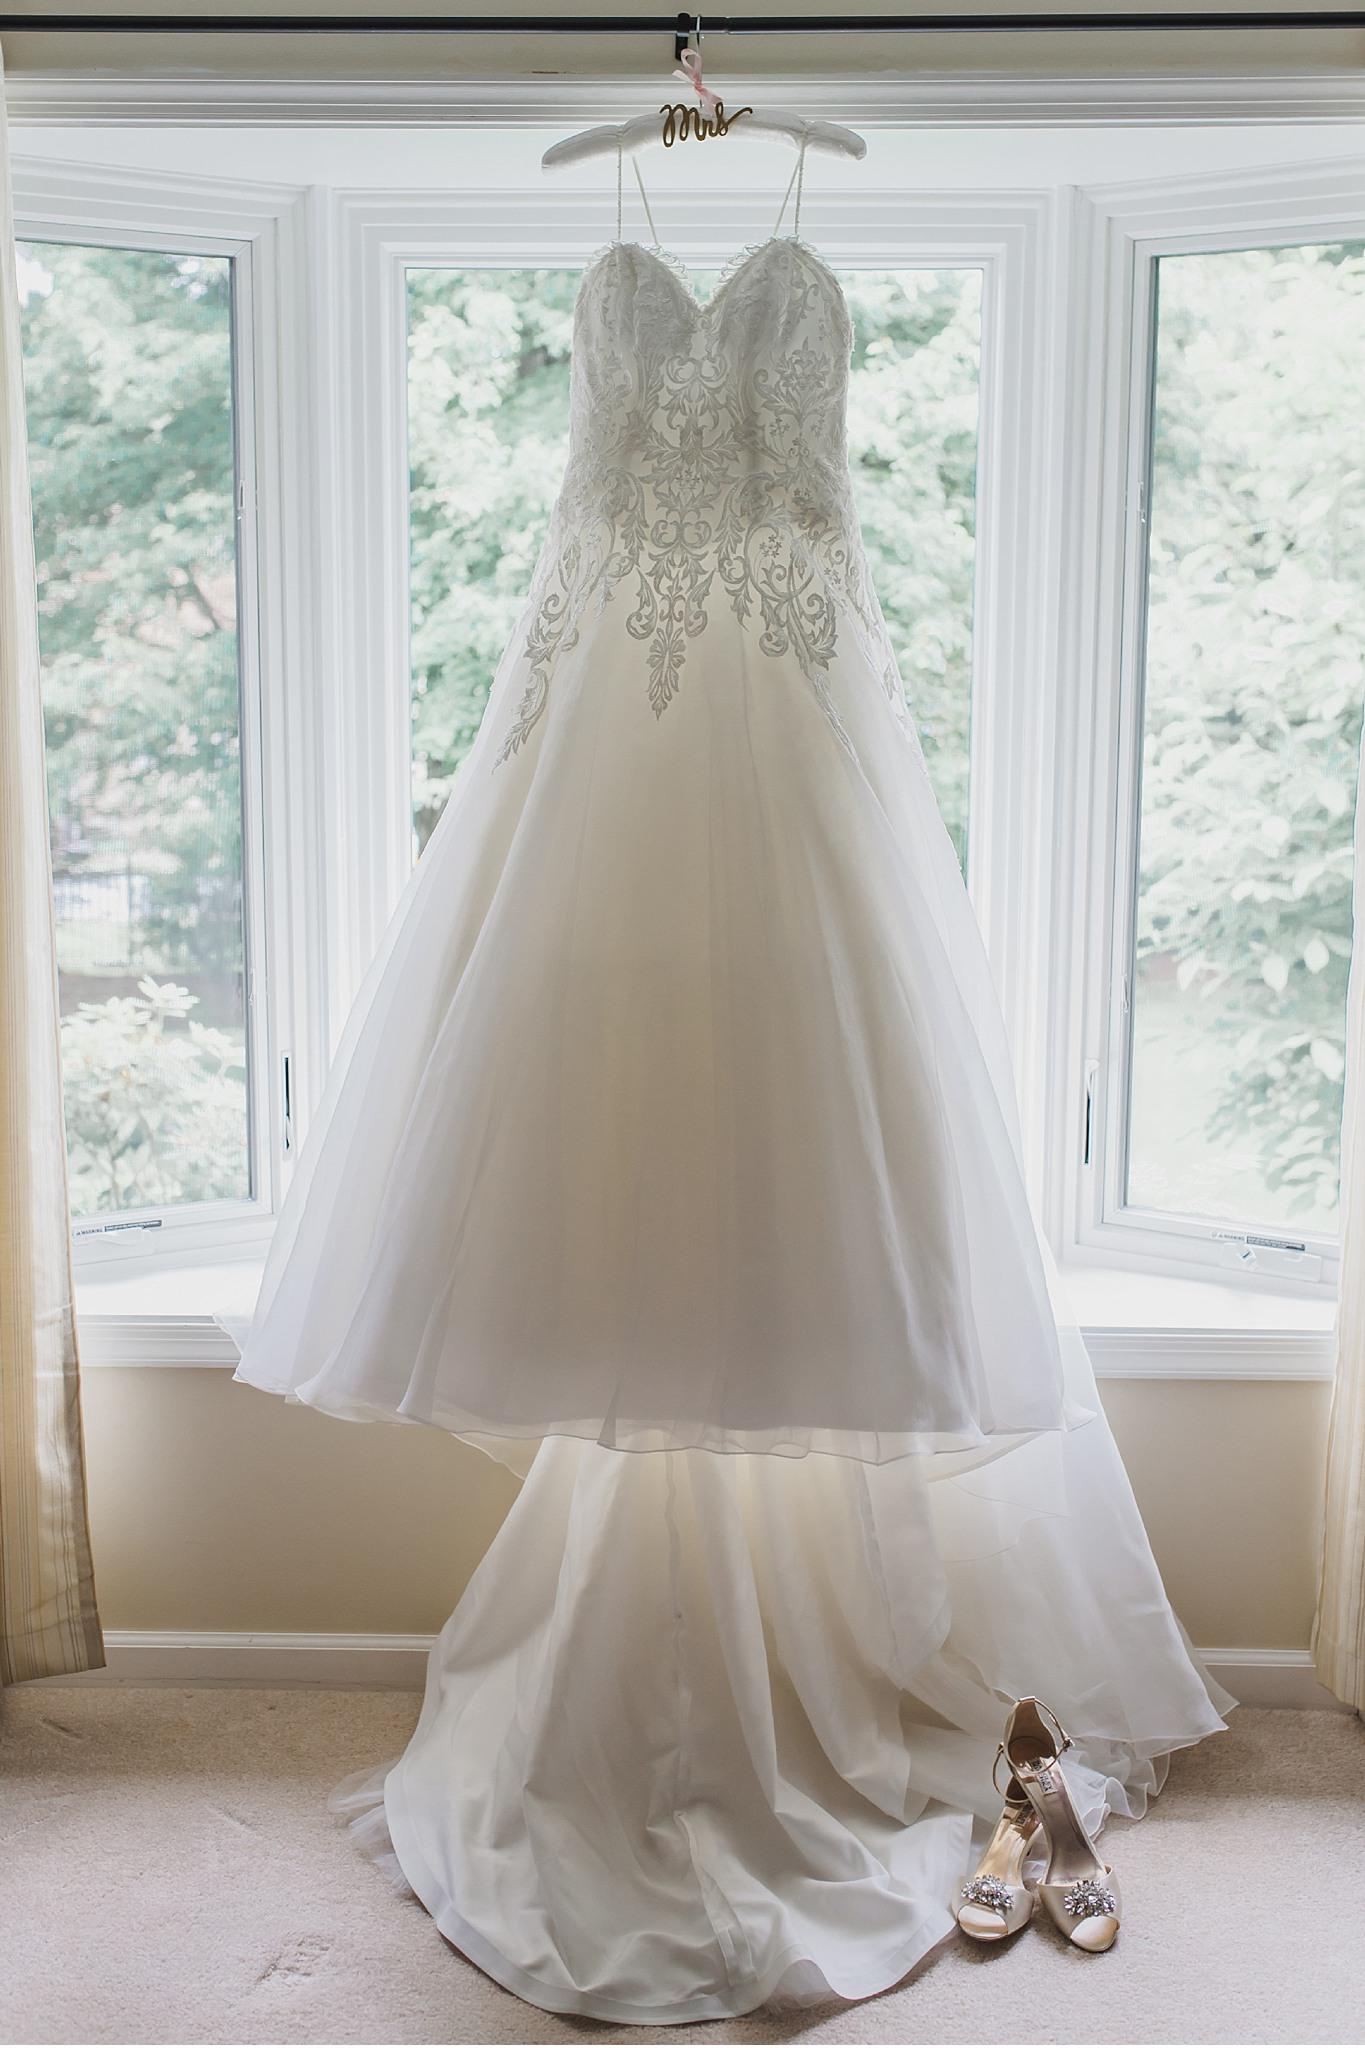 Bridal gown details Hershey Gardens Hershey Country Club Summer beautiful wedding photography_1541.jpg